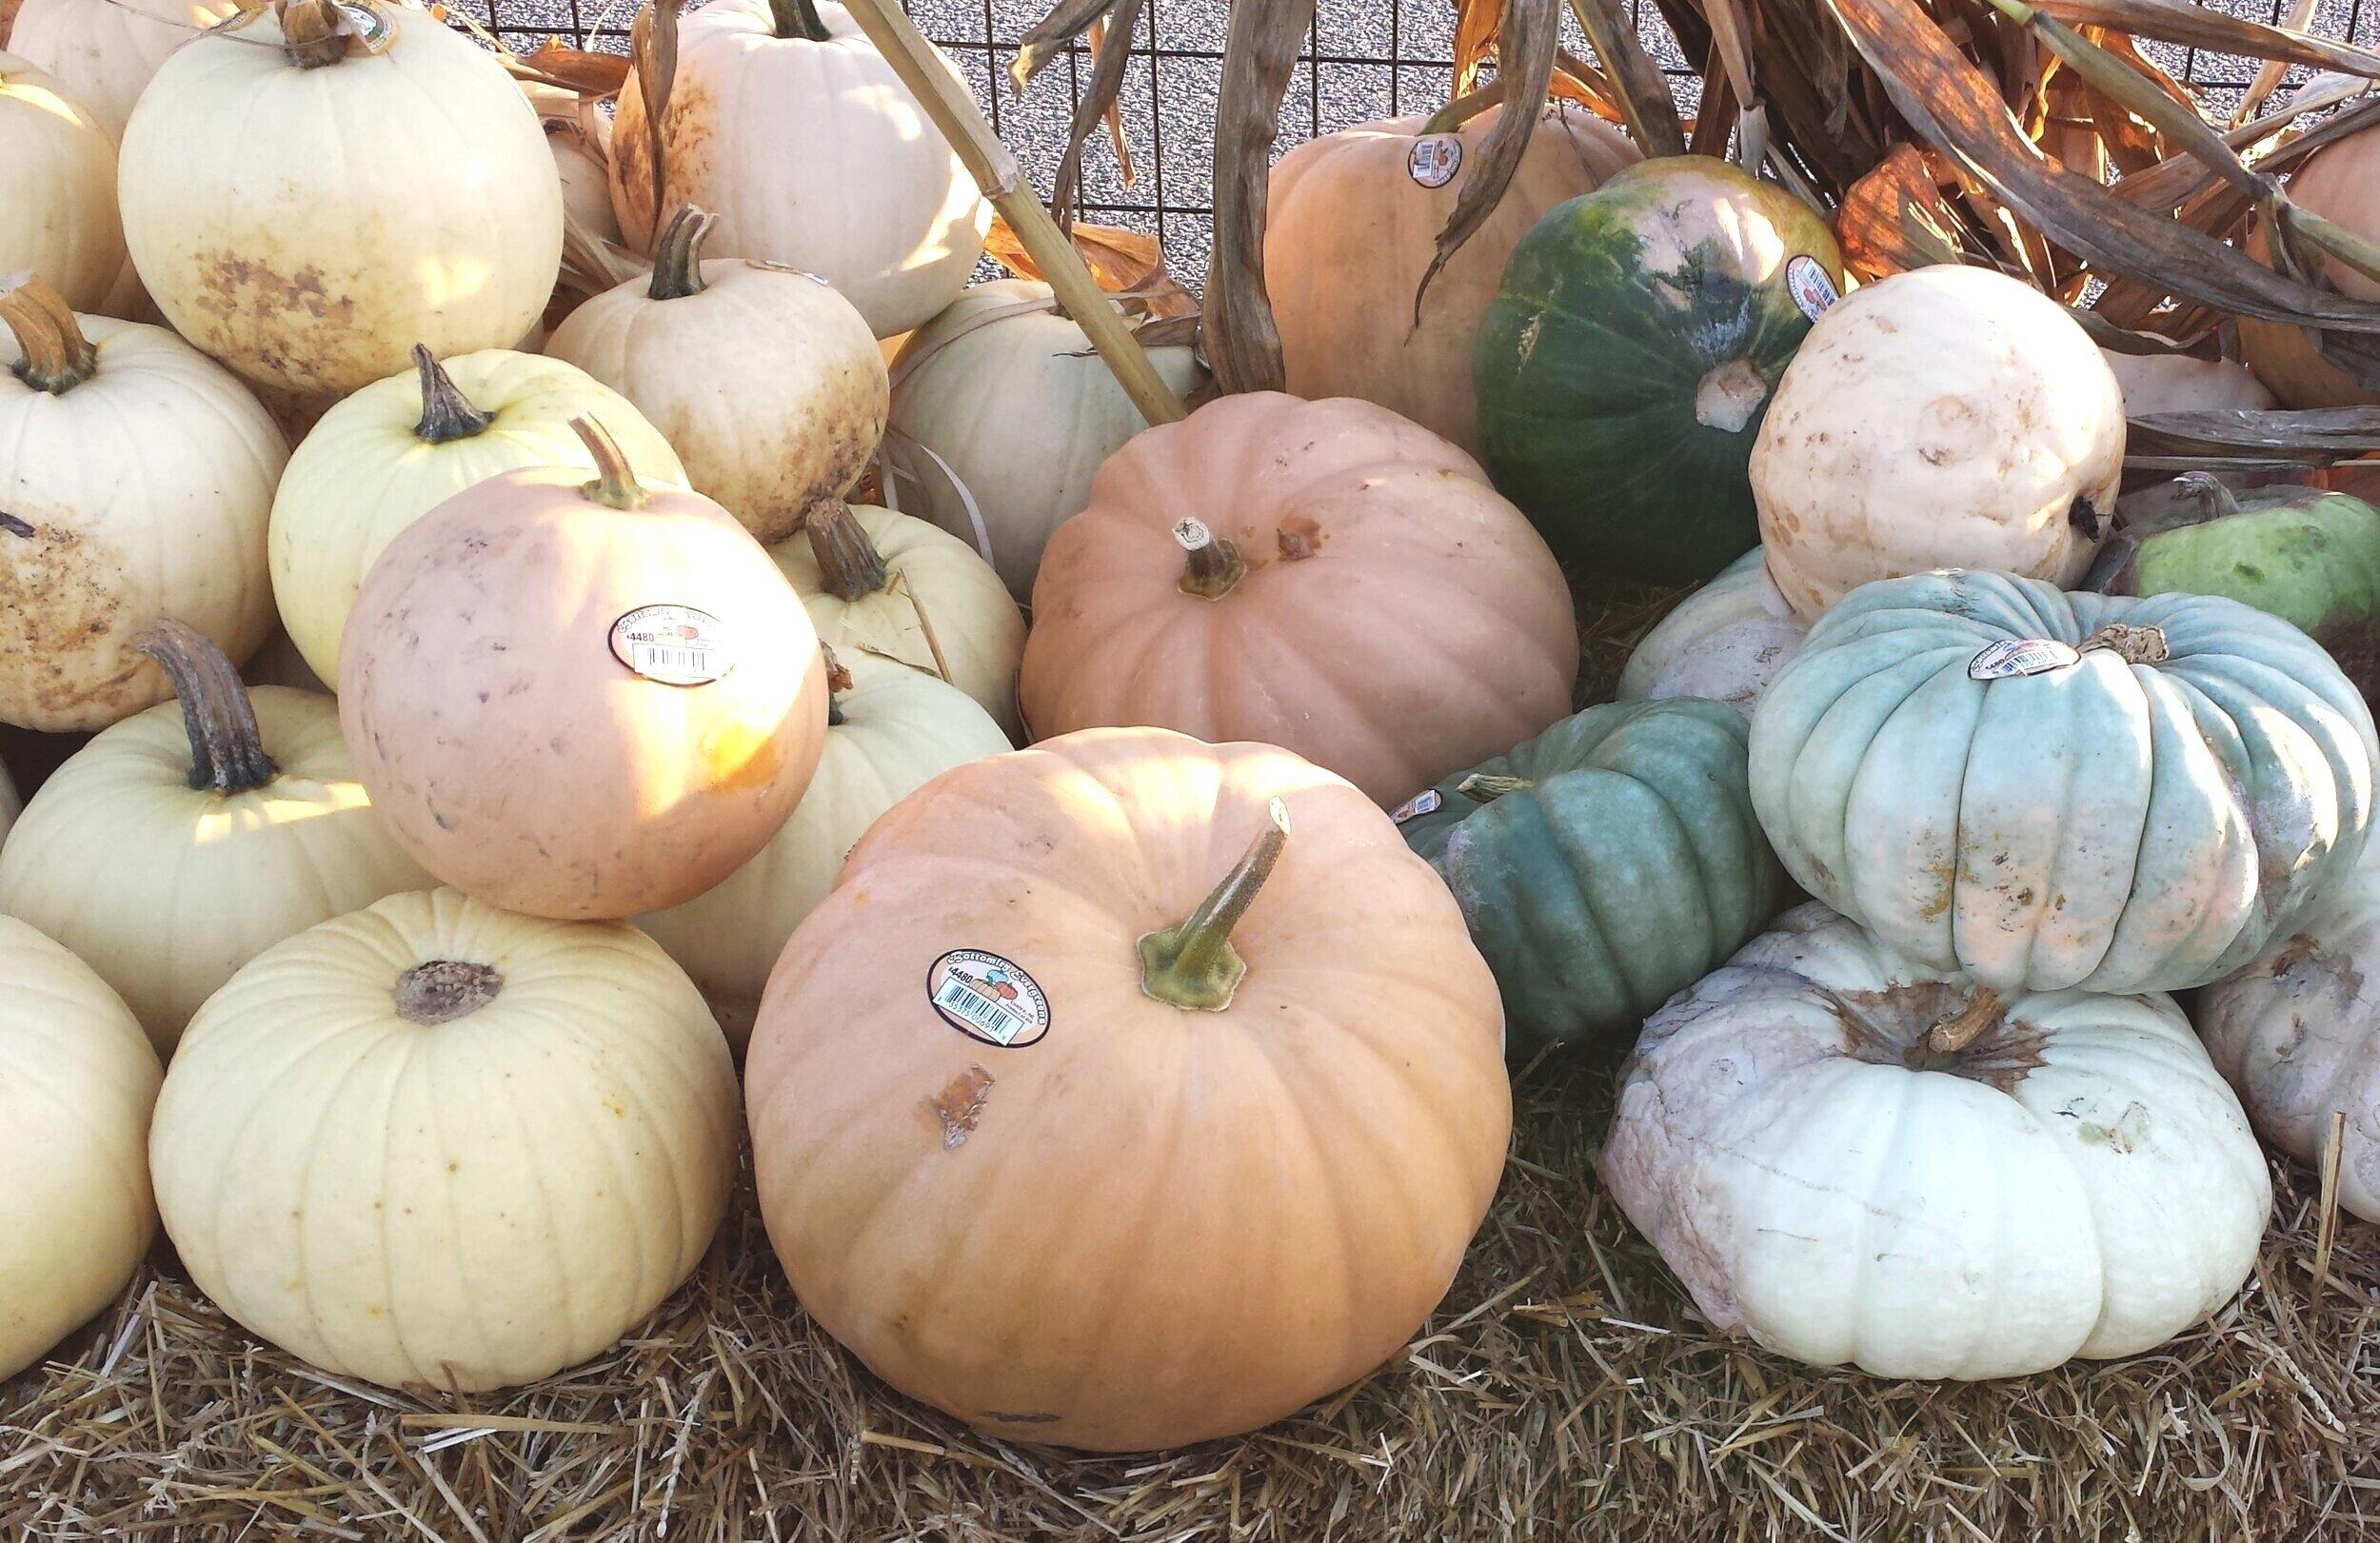 White_Pumpkins_and_Squashes.jpg